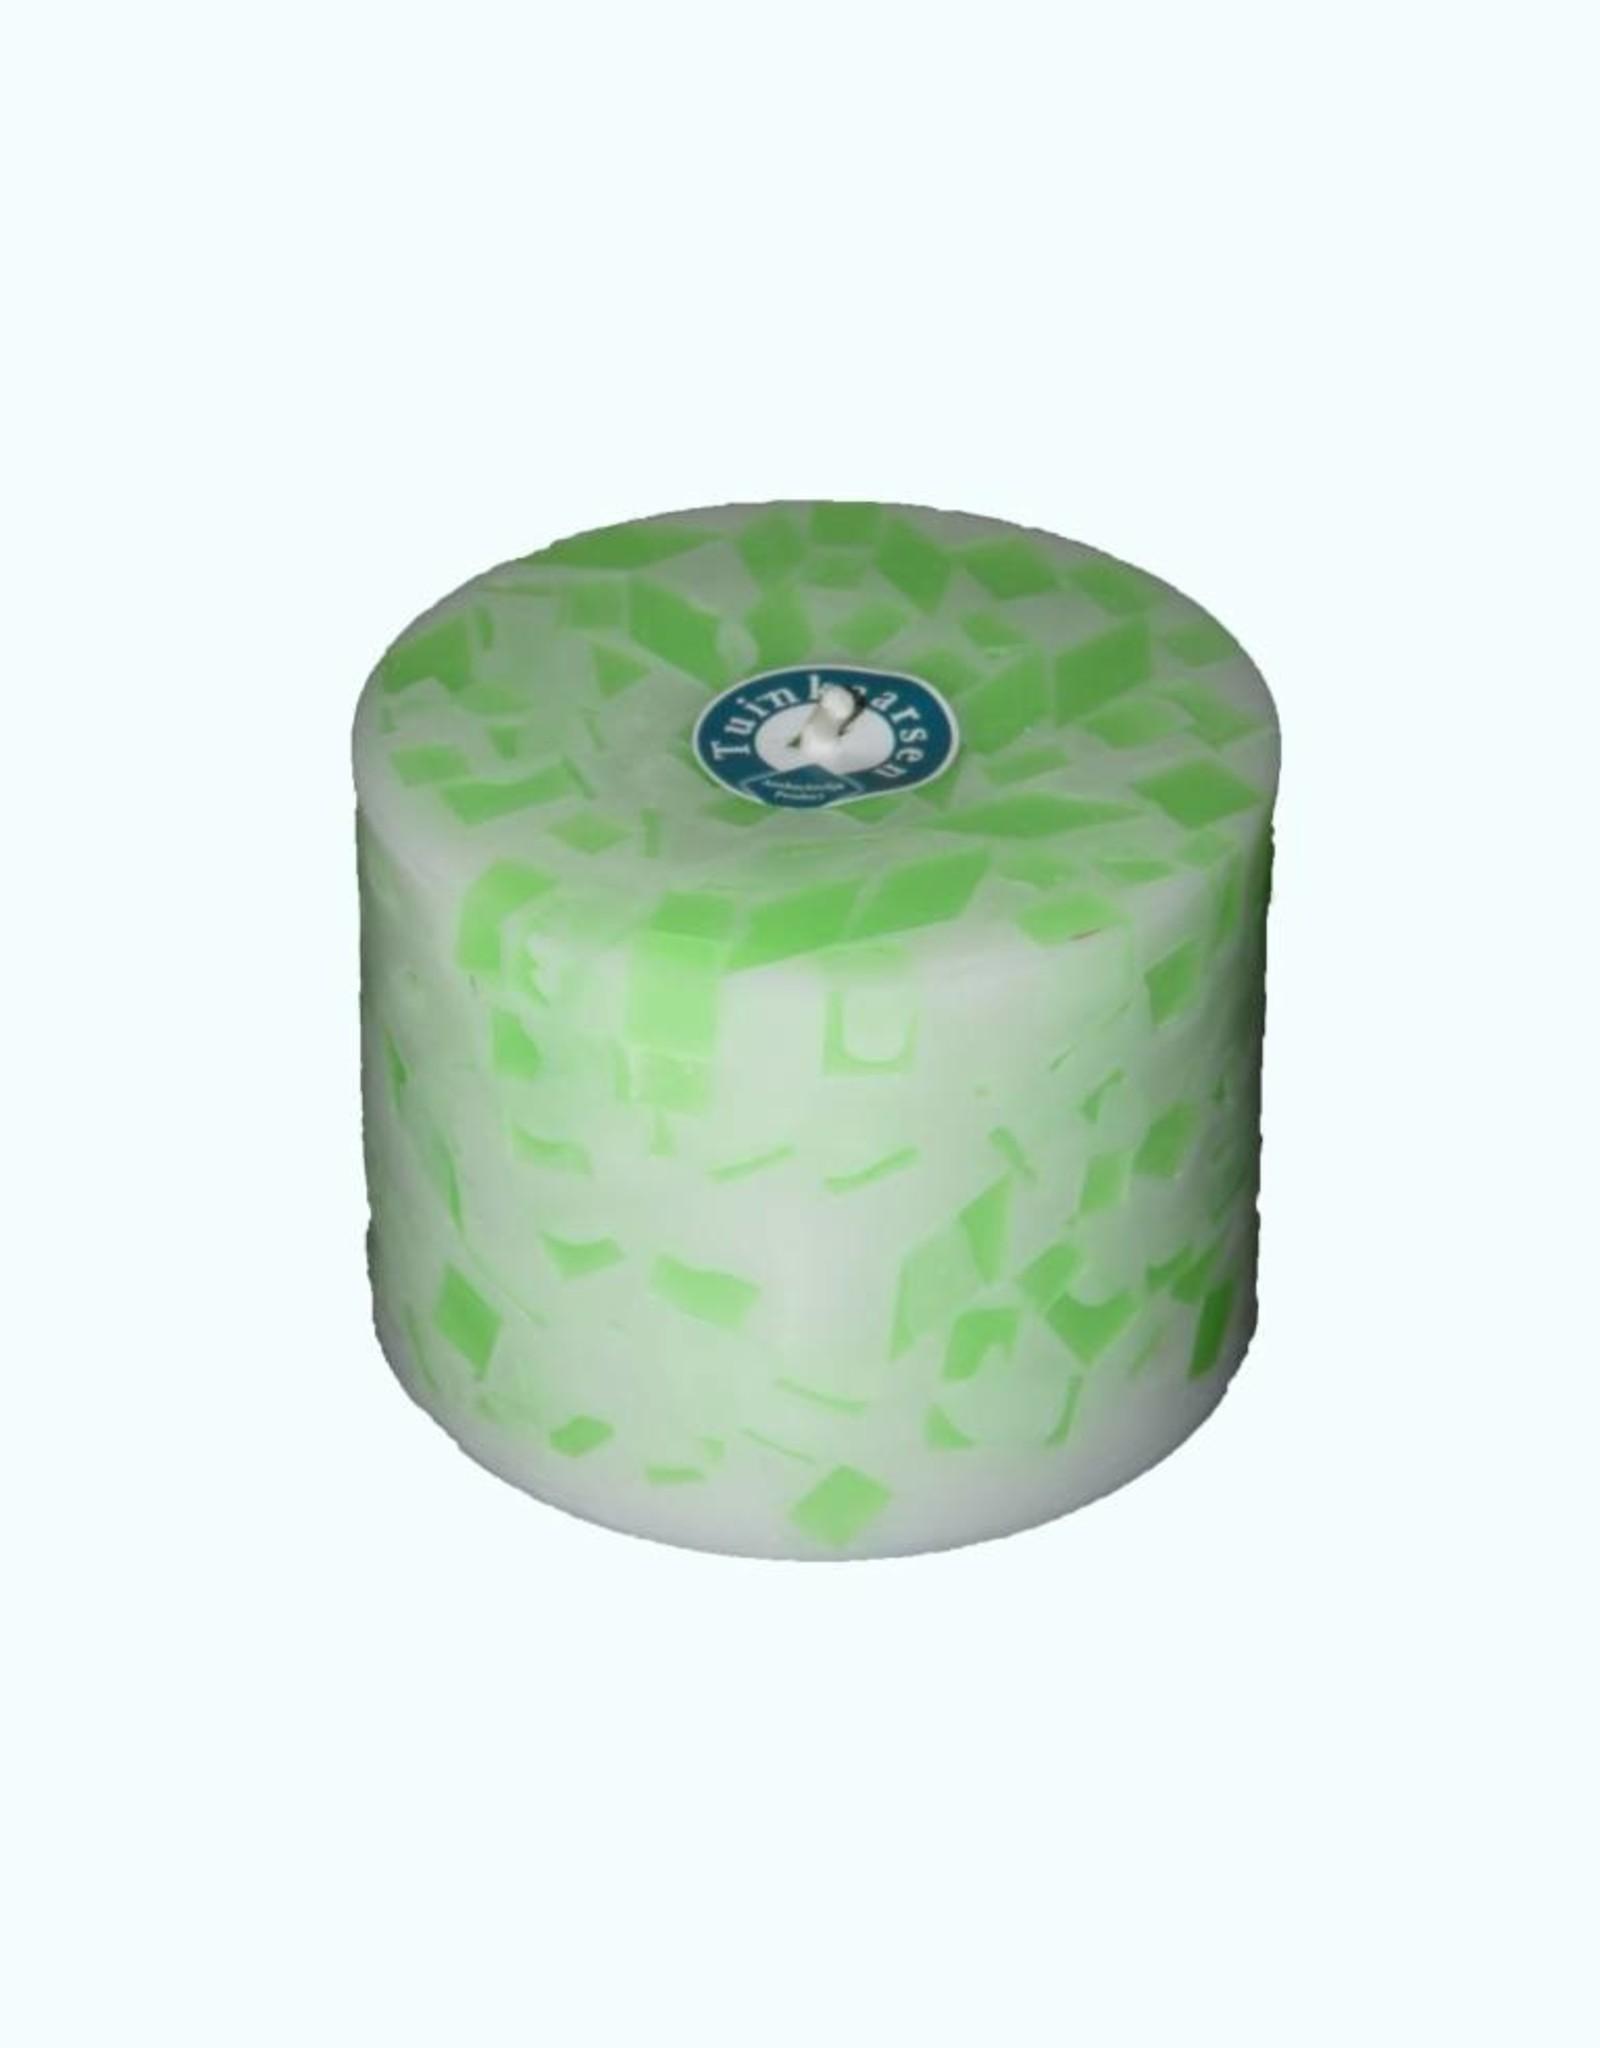 Grote Tuinkaars Mozaïek Groen-Fluor XL Ø 18x12 cm